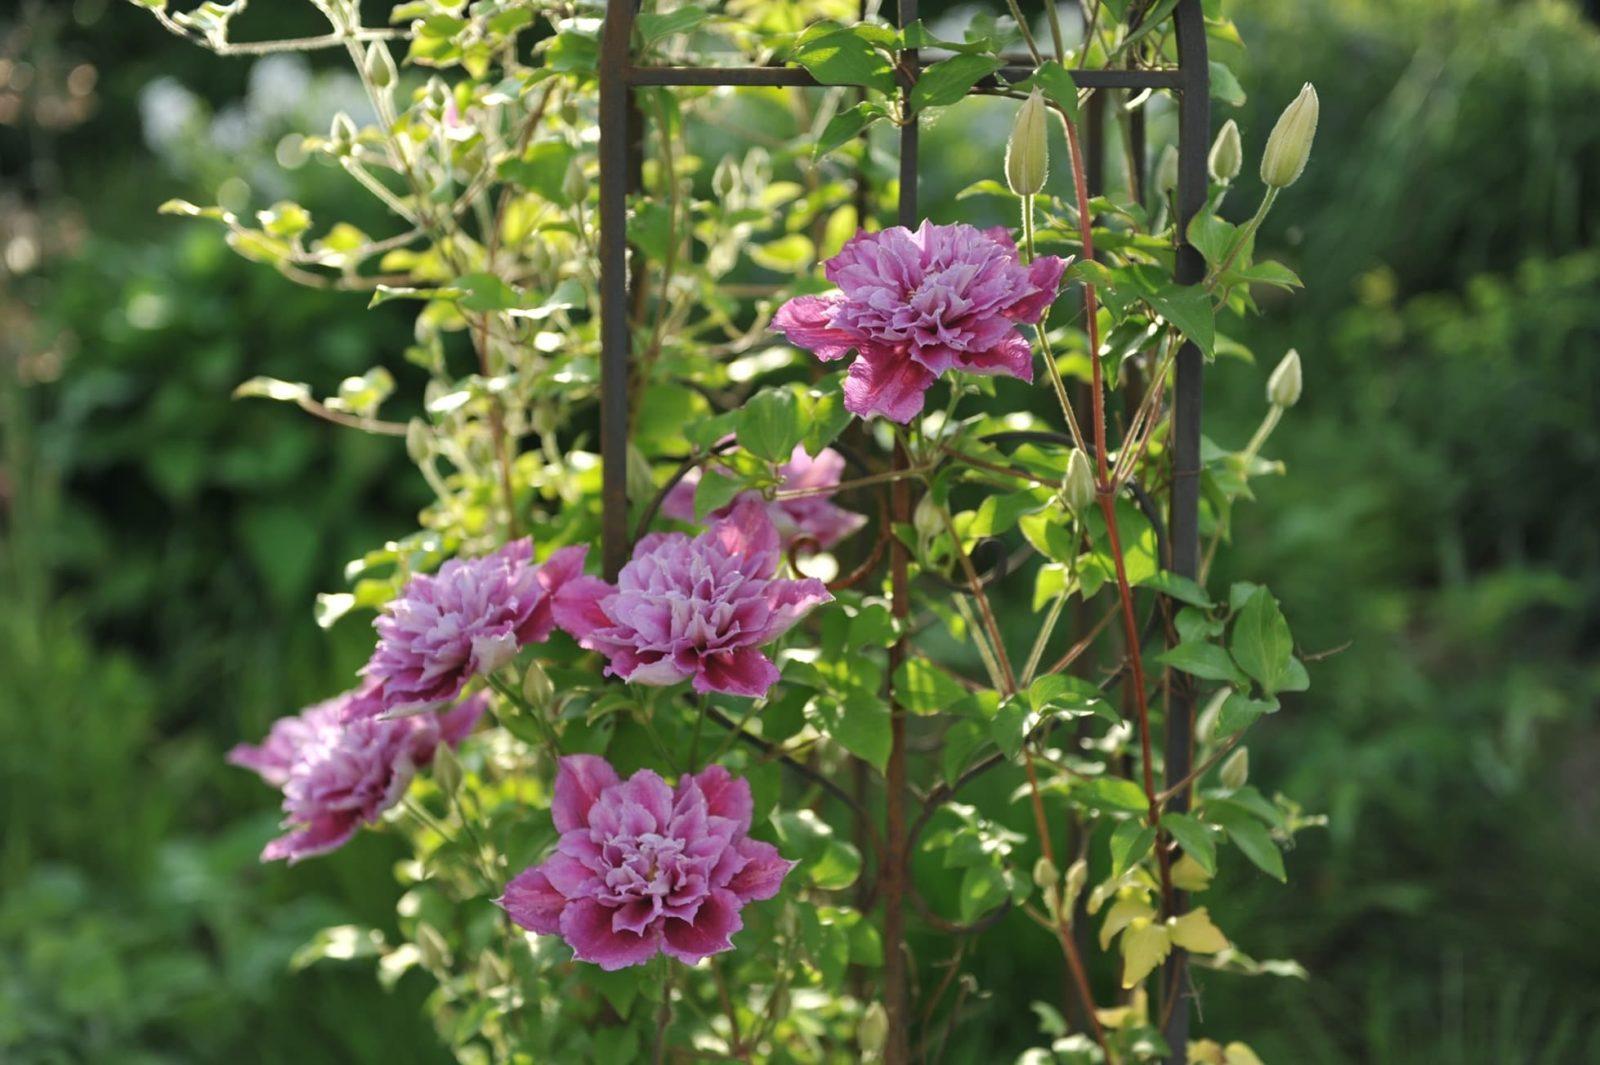 pink clematis piilu growing up a garden obelisk